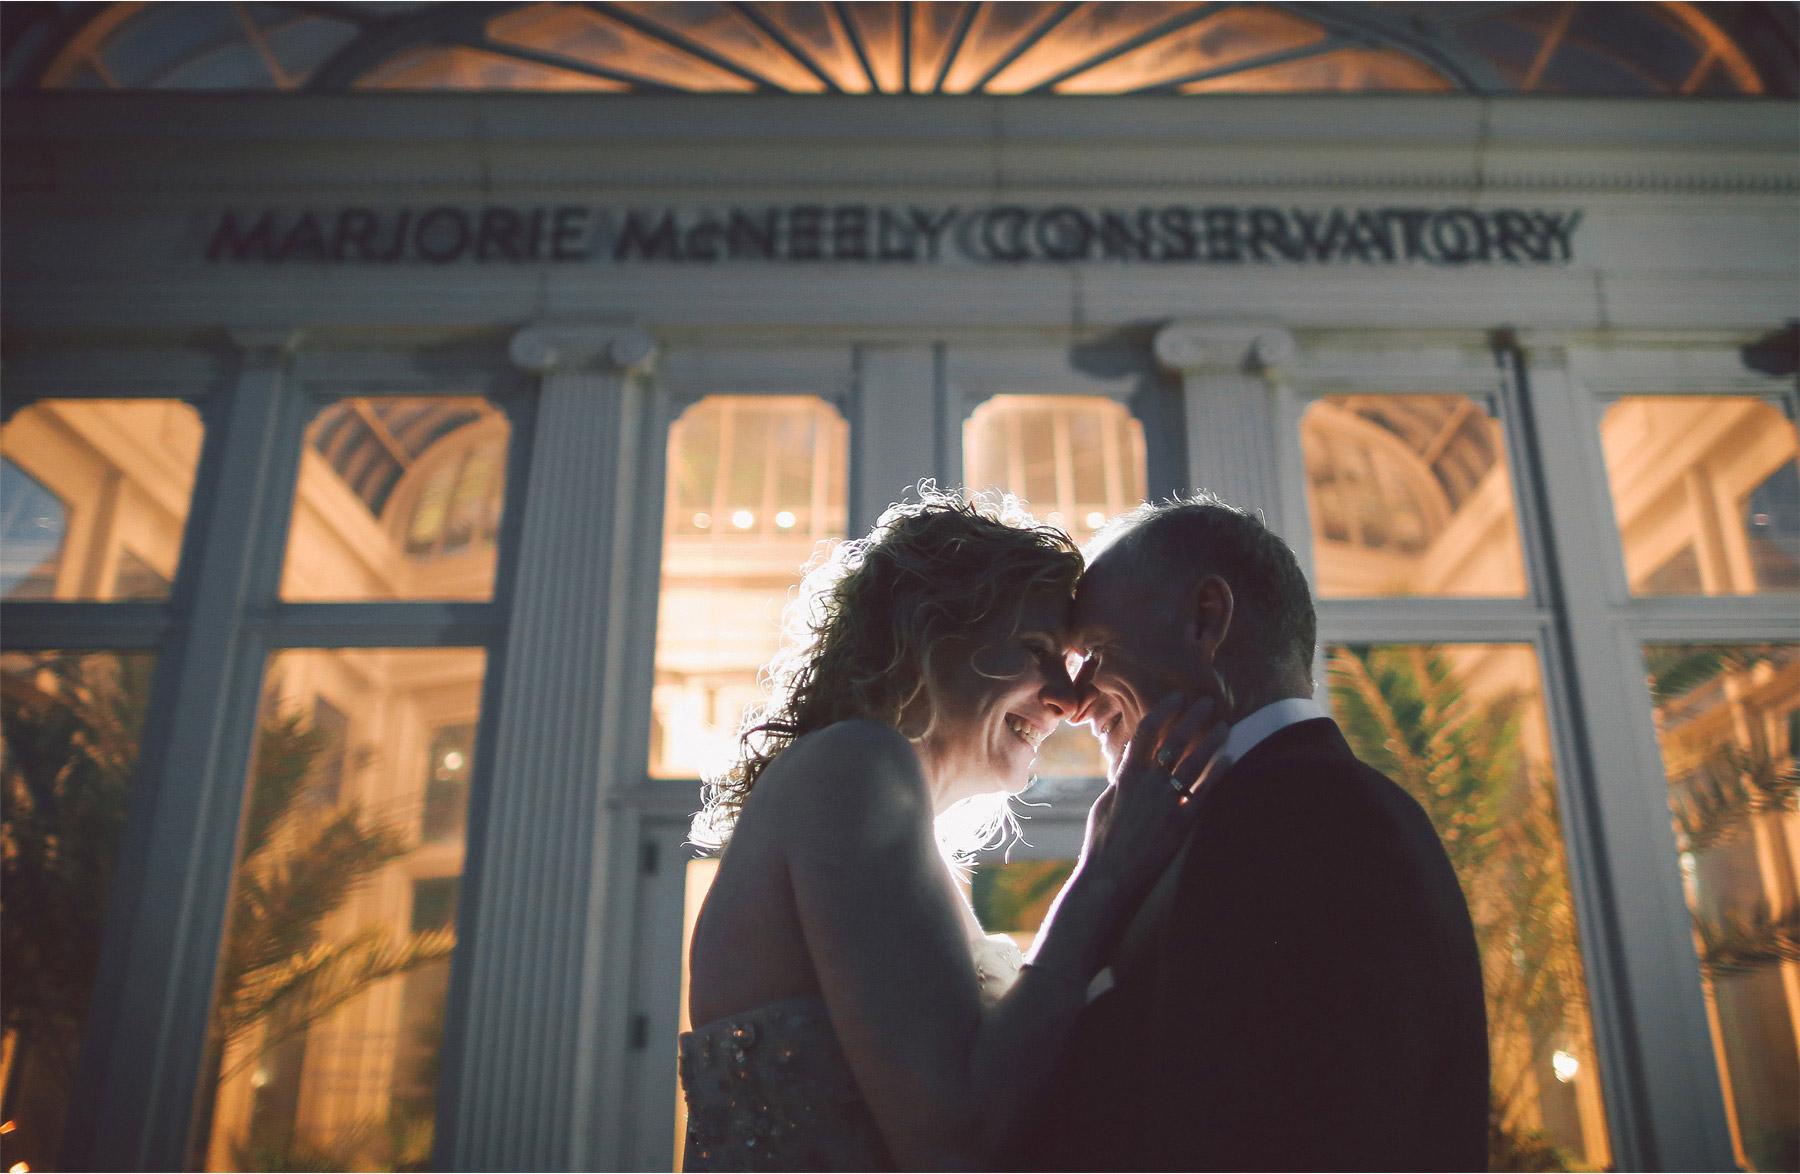 09-Saint-Paul-Minnesota-Wedding-Photographer-by-Andrew-Vick-Photography-Winter-Como-Park-Conservatory-Sunken-Garden-Bride-Groom-Embrace-Night-Vintage-Dannette-and-Darren.jpg